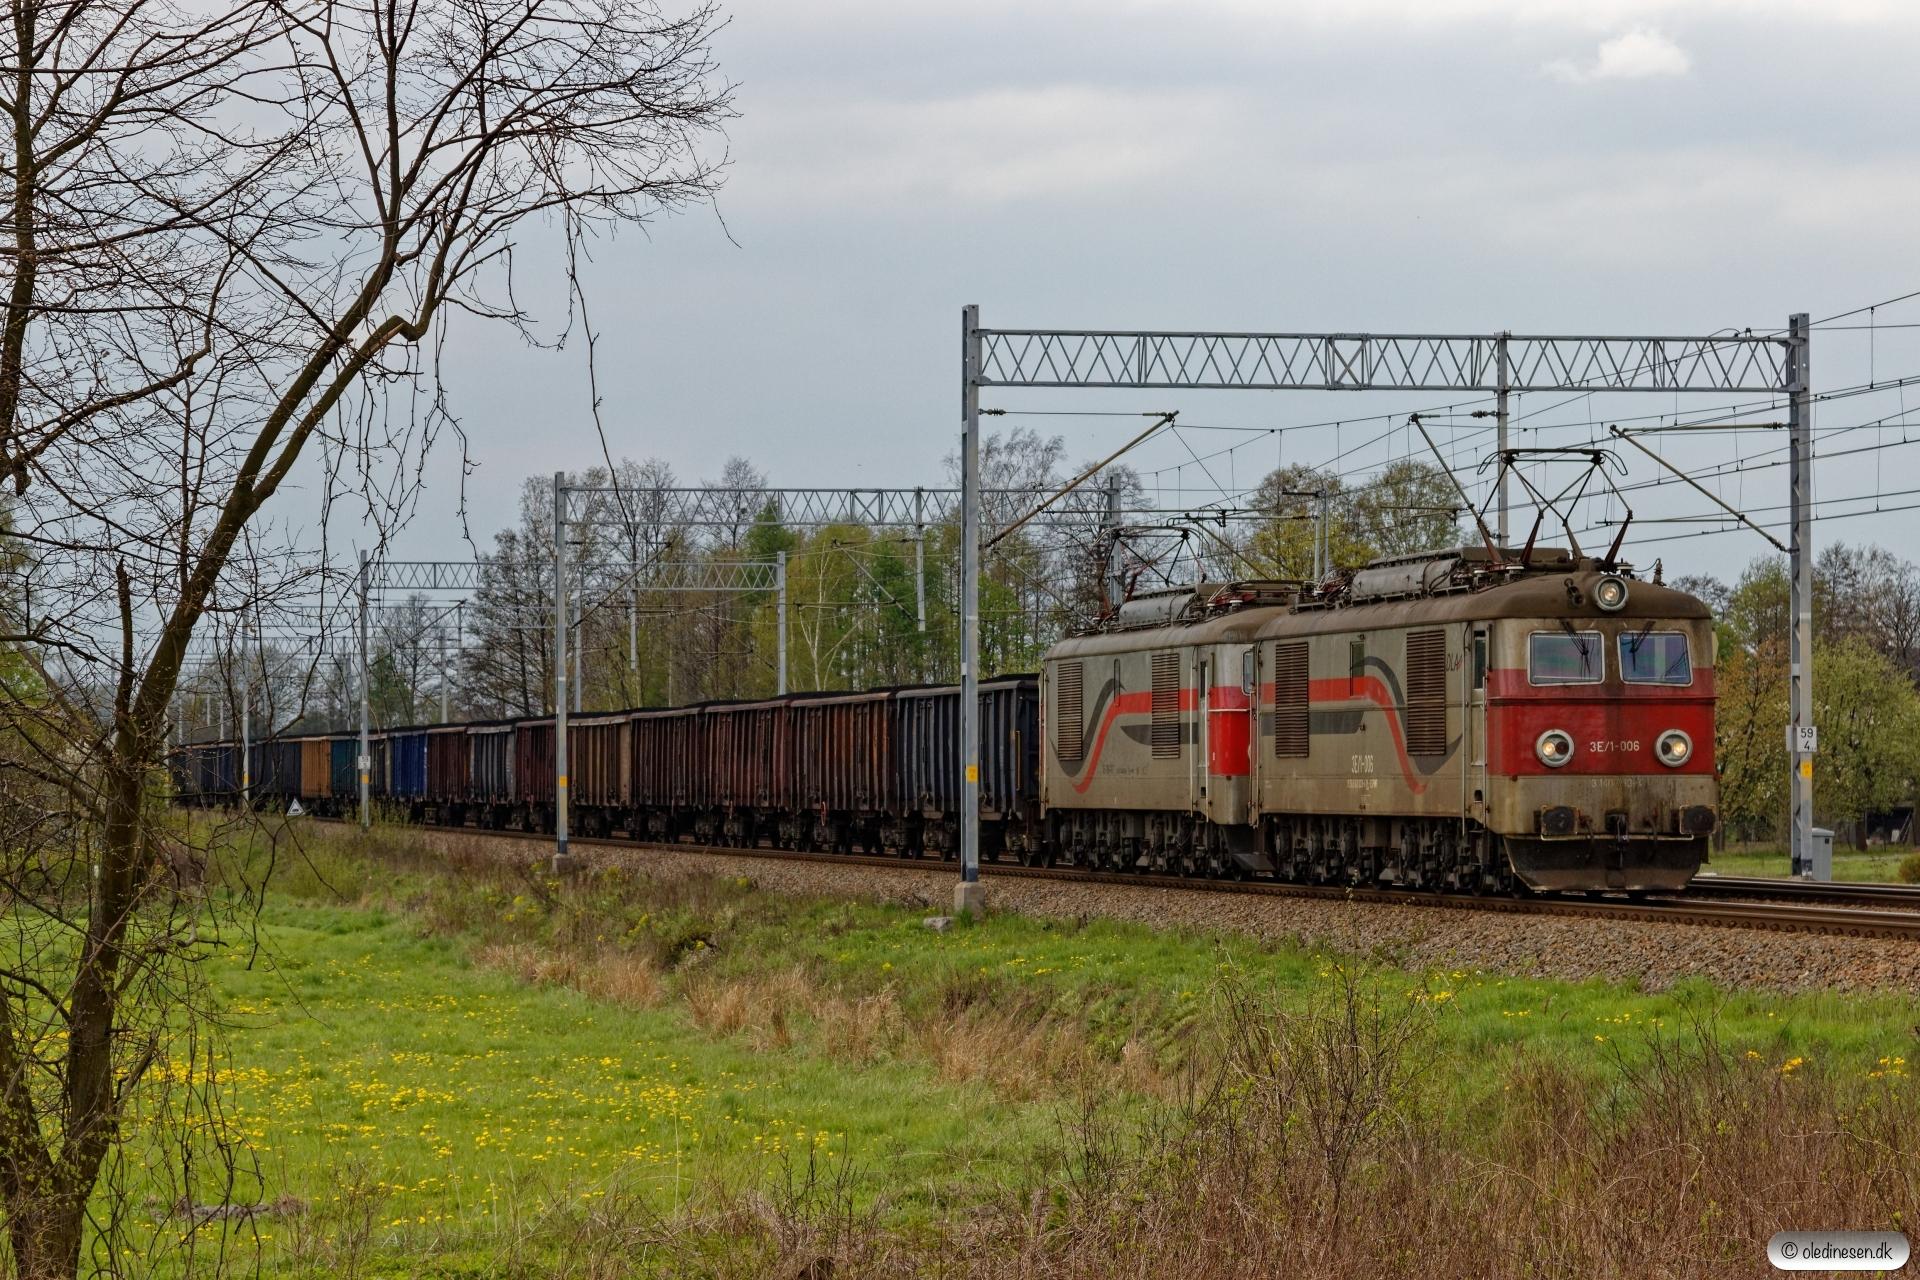 ASPWR 3E/1-006+3E-100-117+41 Eaos. Chybie - Bronów 23.04.2019 kl. 13.57.